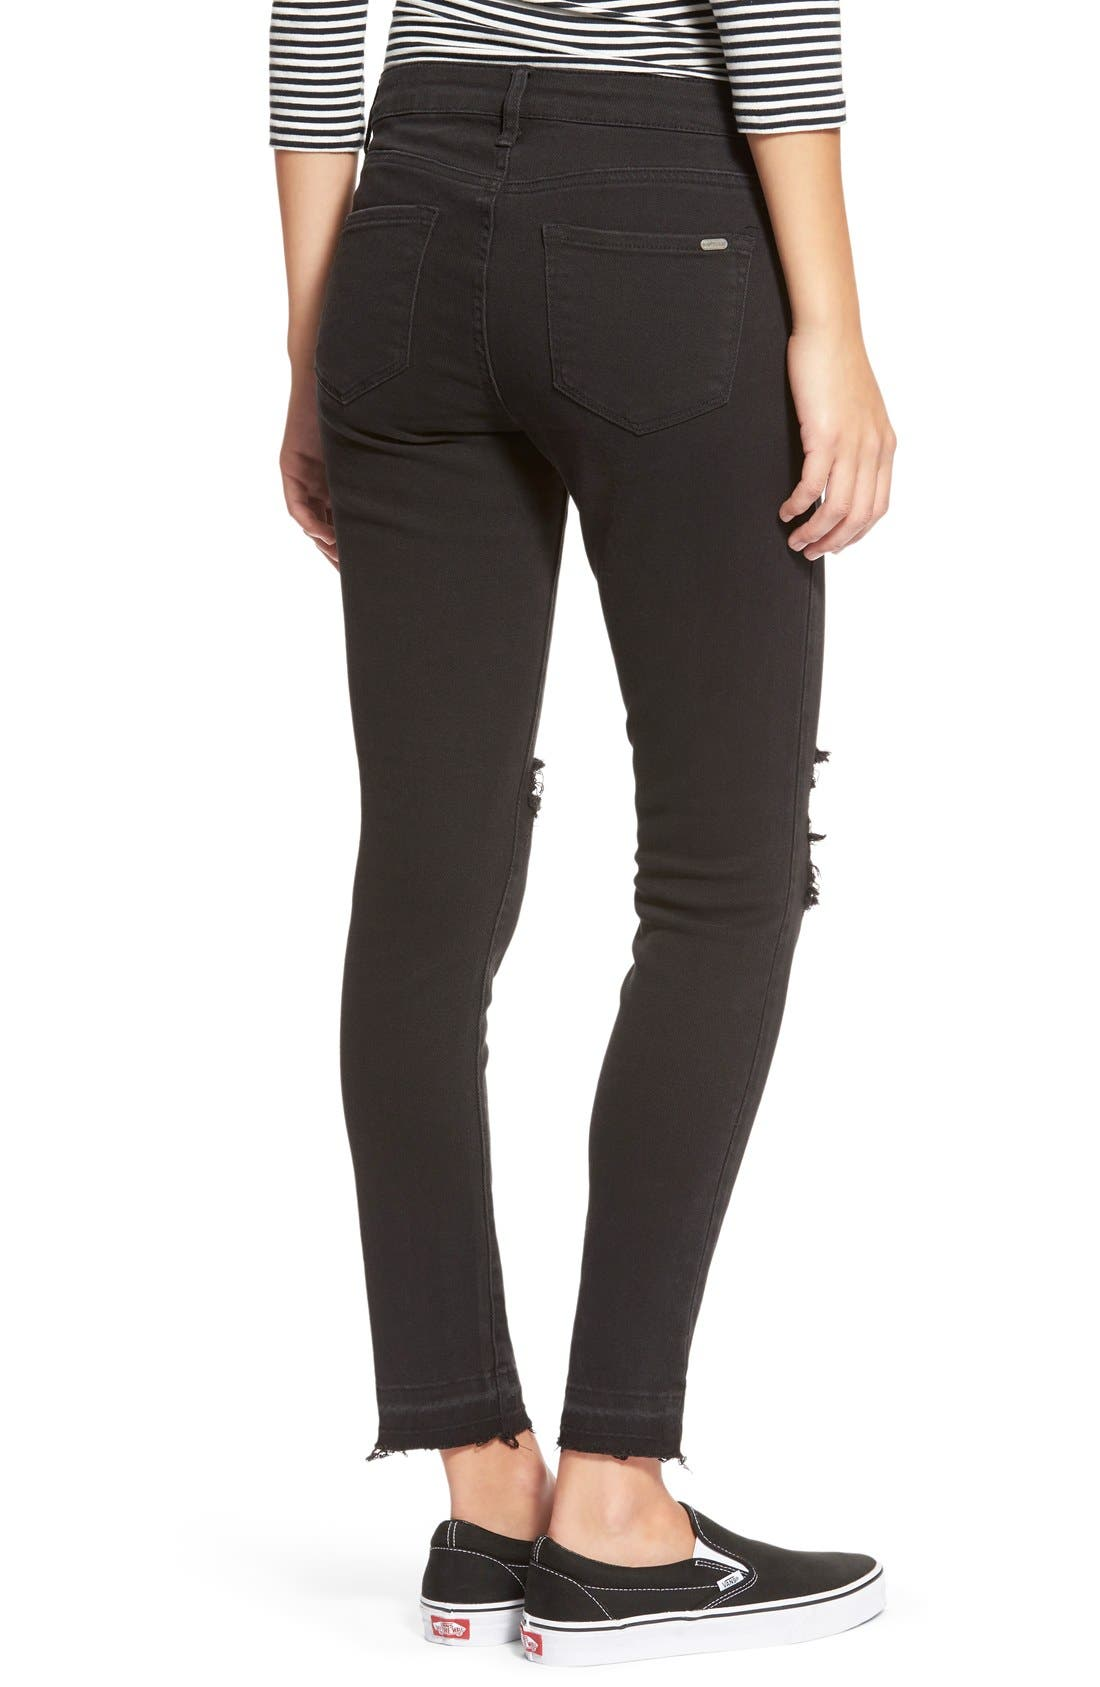 Alternate Image 3  - STSBlue 'Emma' Distressed High Rise Ankle Skinny Jeans (Black)